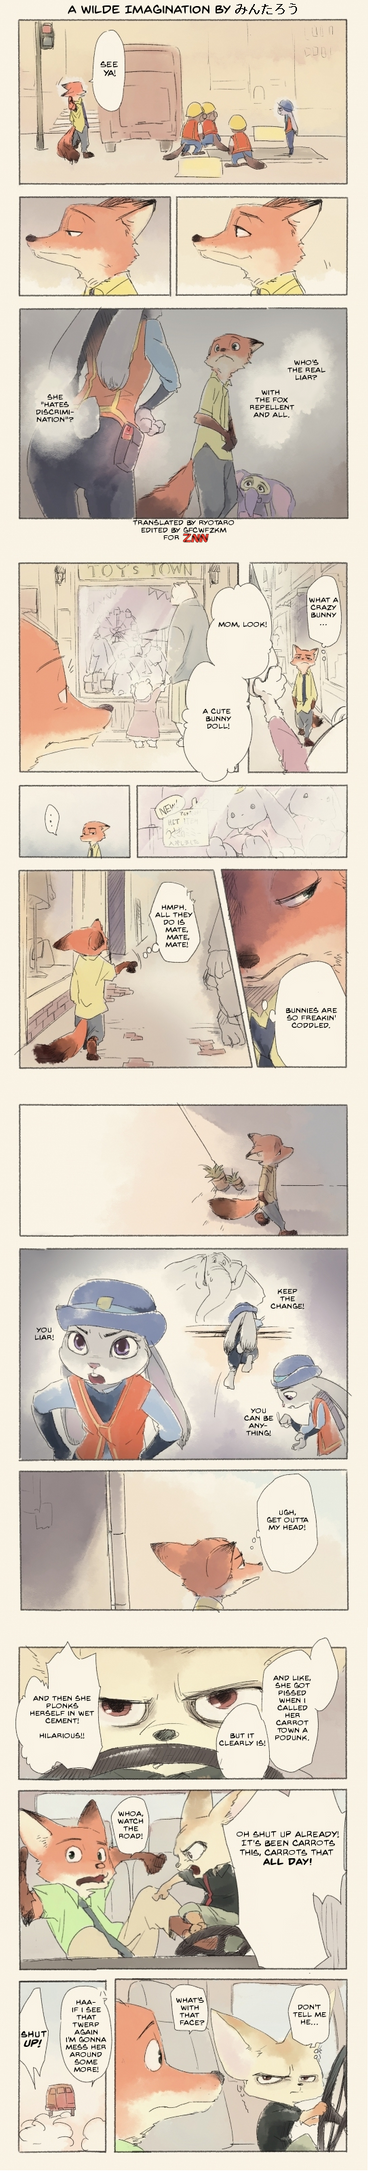 'A Wilde Imagination' by Mintarou (translation) by gfcwfzkm